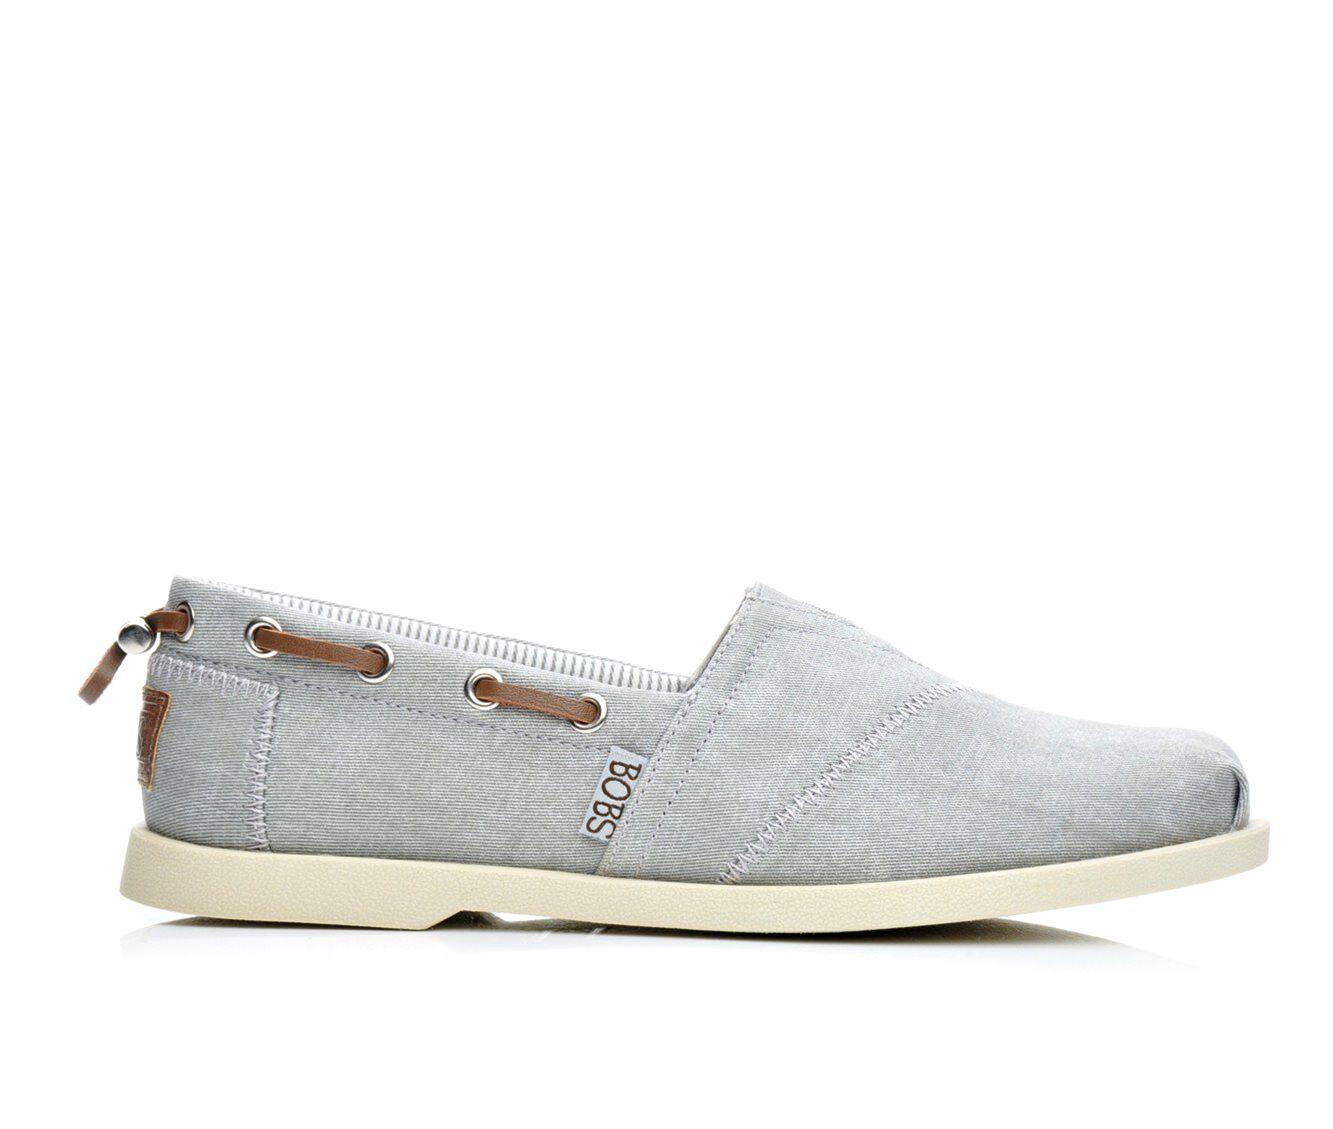 uk shoes_kd3219